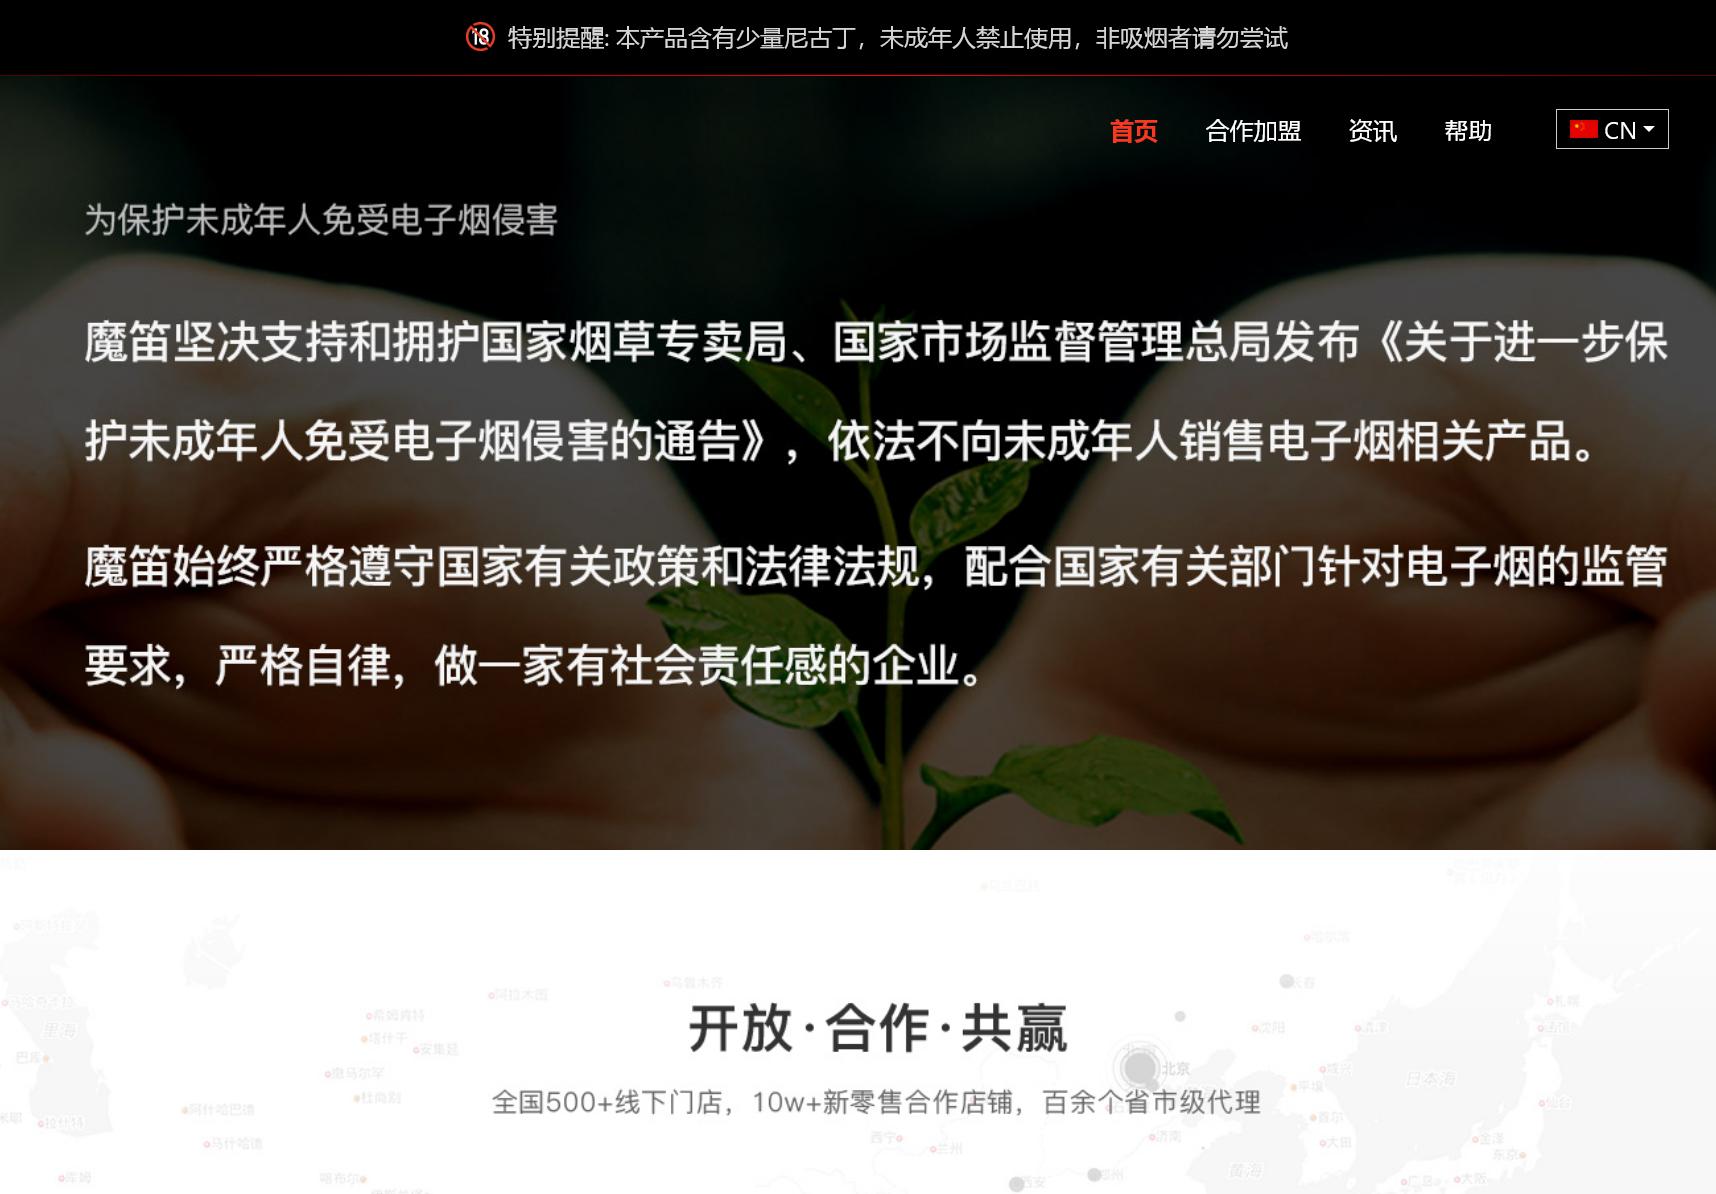 moti魔笛电子烟官网网址,魔笛品牌介绍